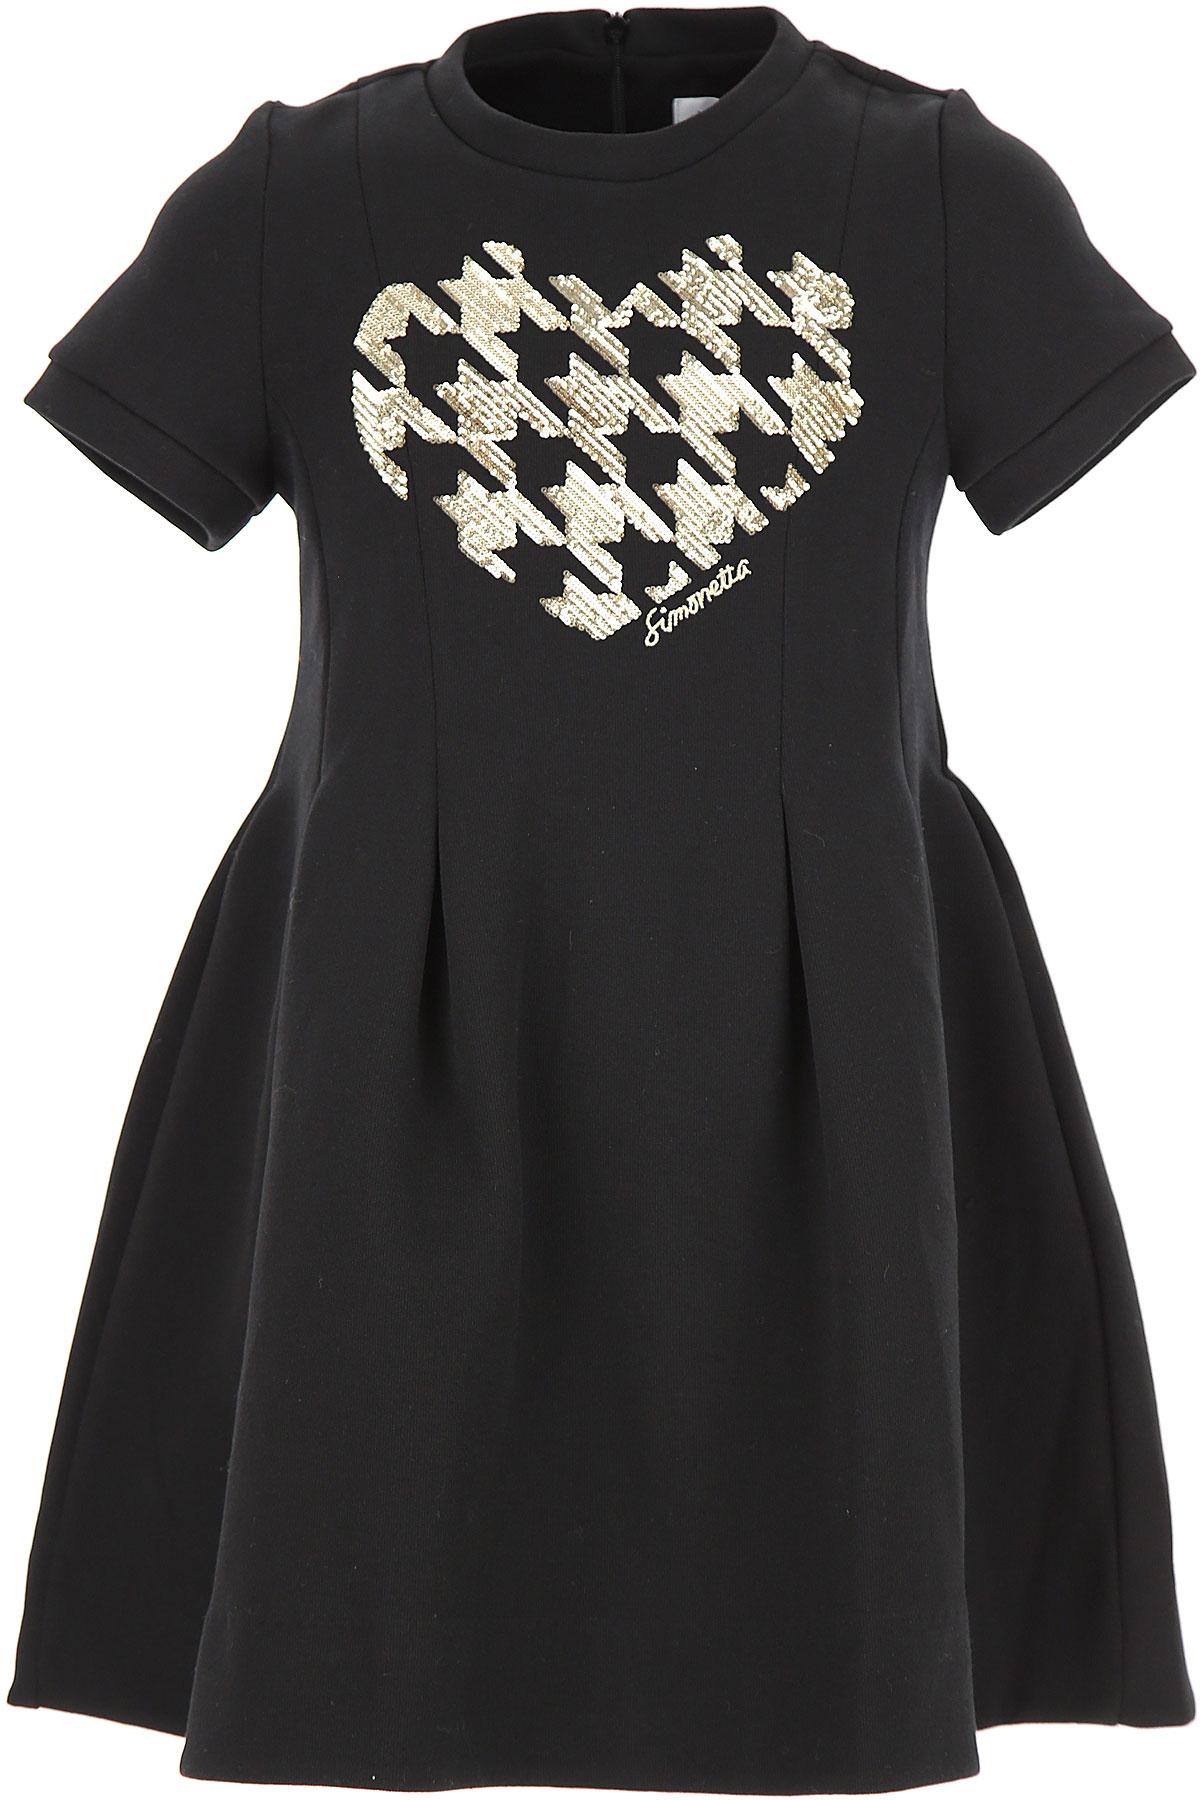 Image of Simonetta Girls Dress, Black, Cotton, 2017, 10Y 14Y 16Y 6Y 8Y